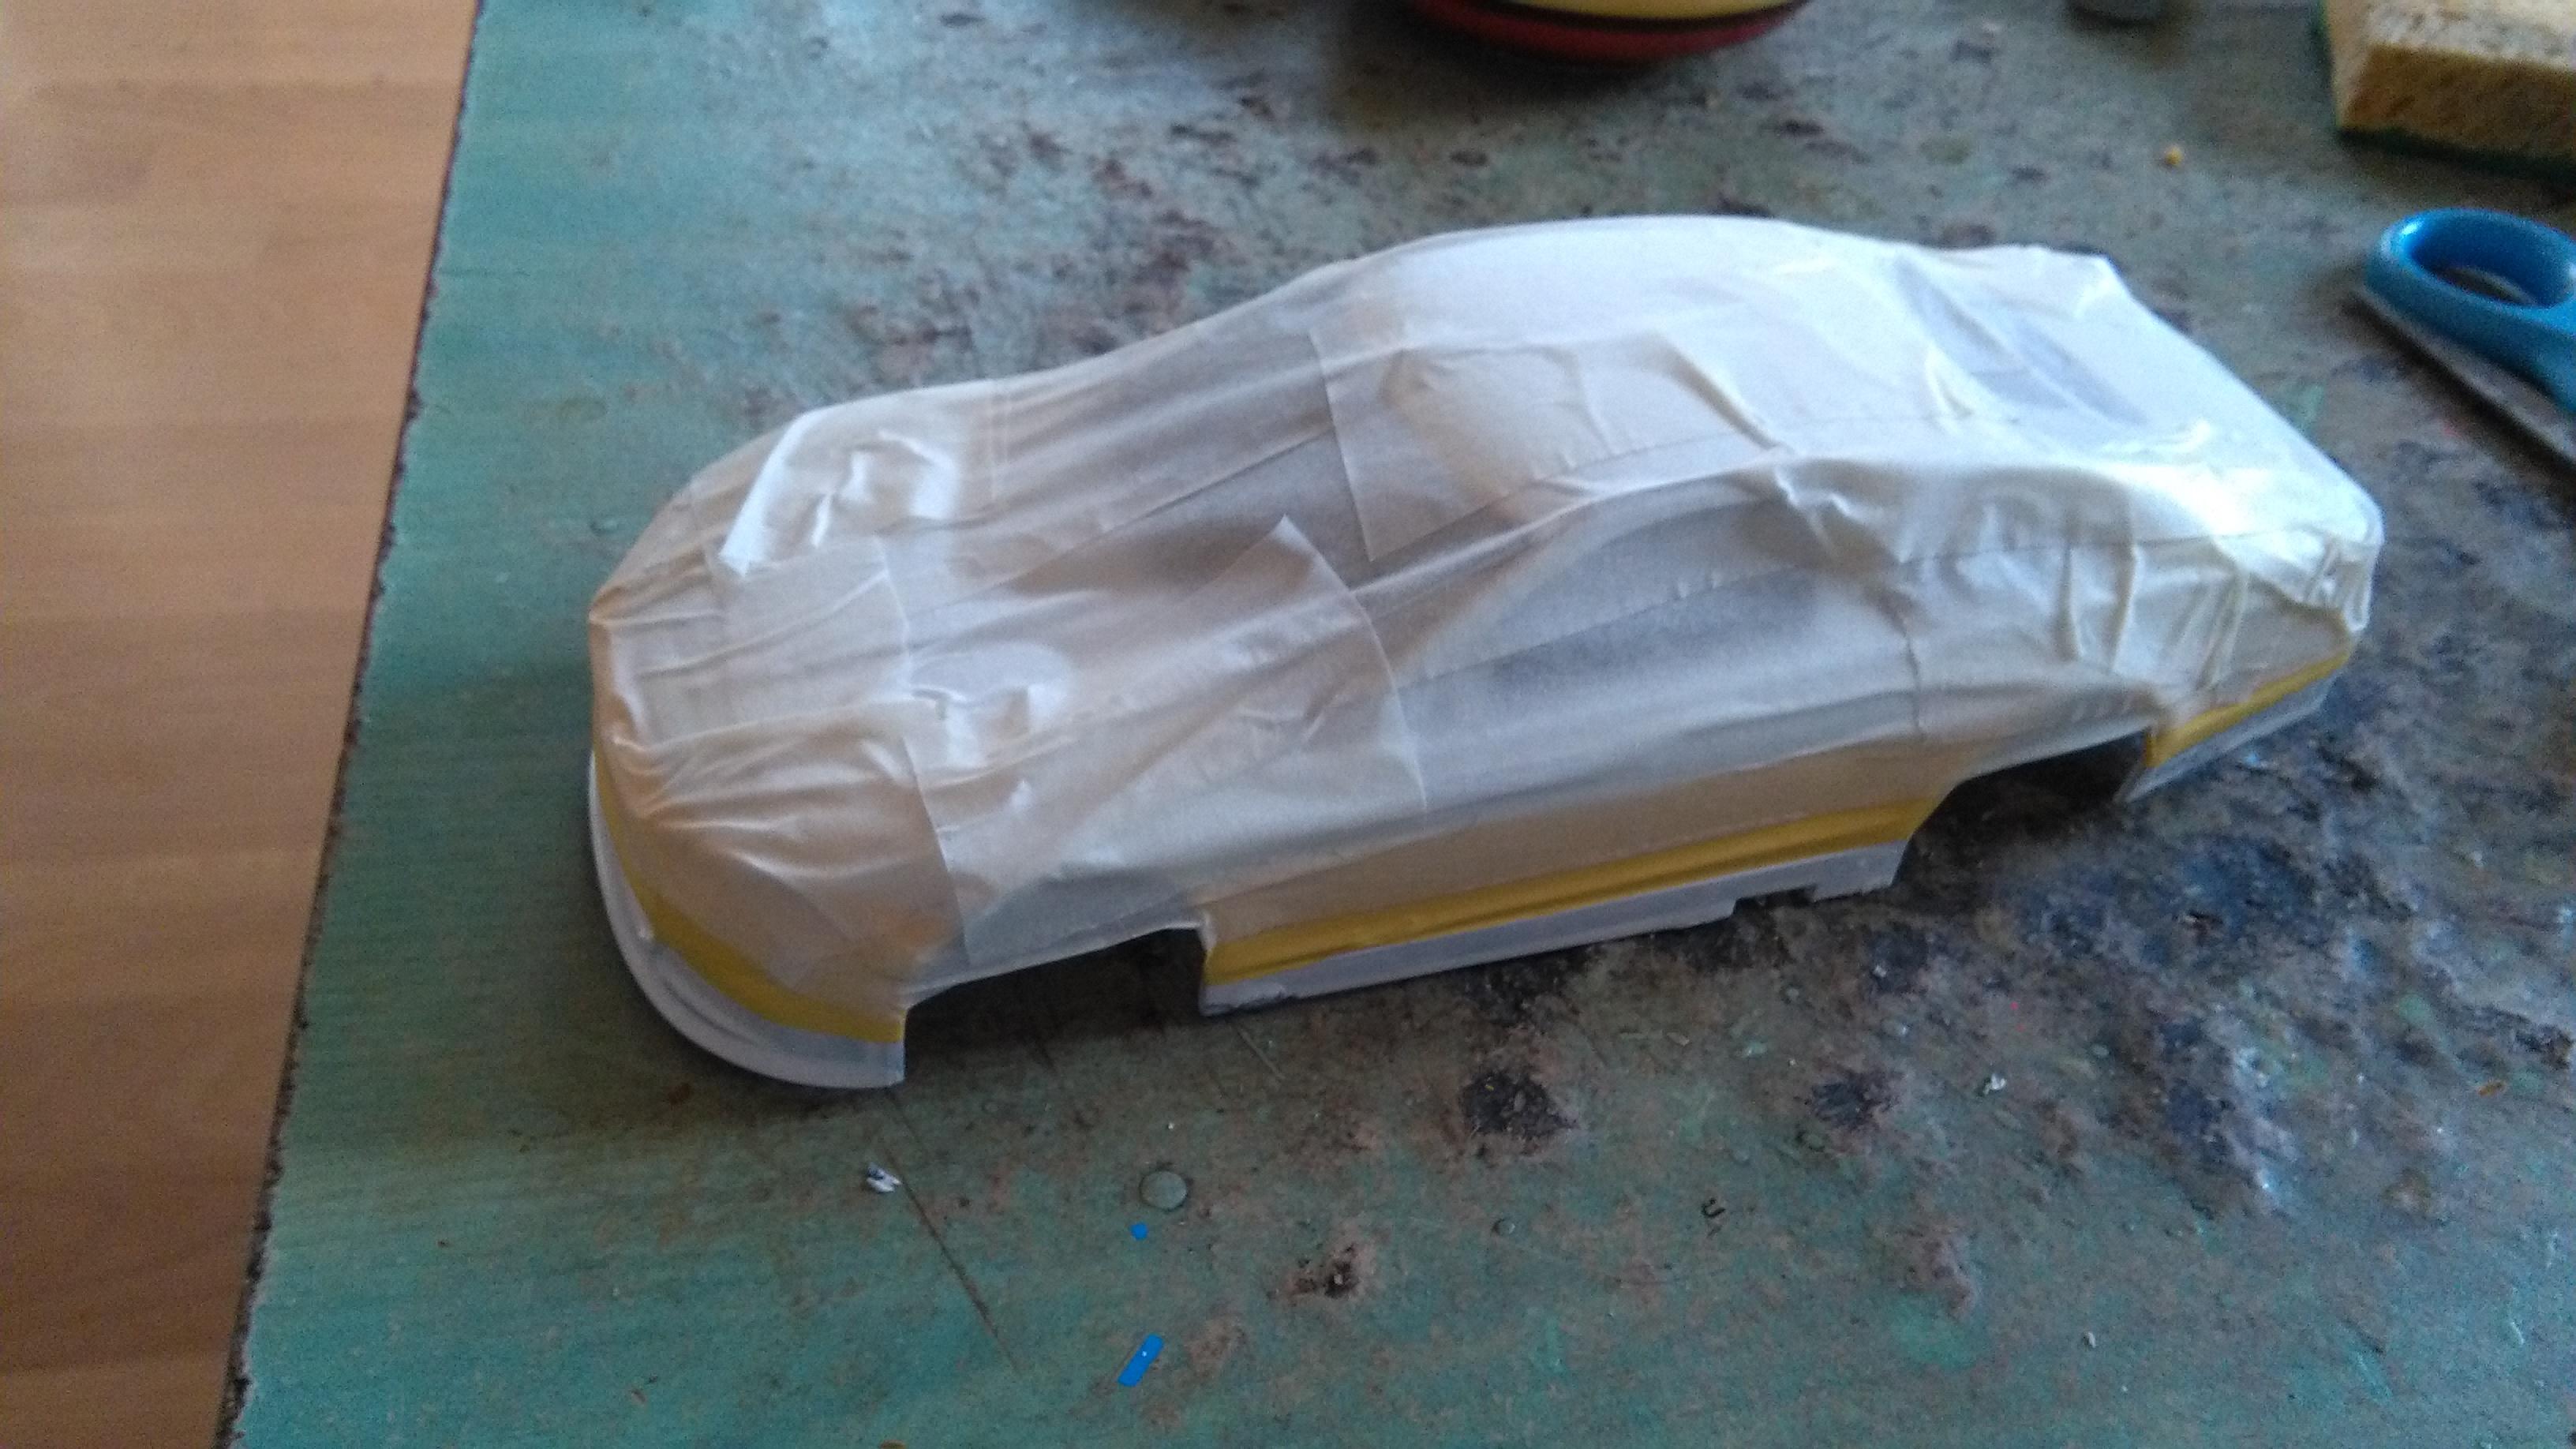 Ford Fusion Penskee 2014 #2 Brad K. Miller Lite - CHASE Version 638652F201320